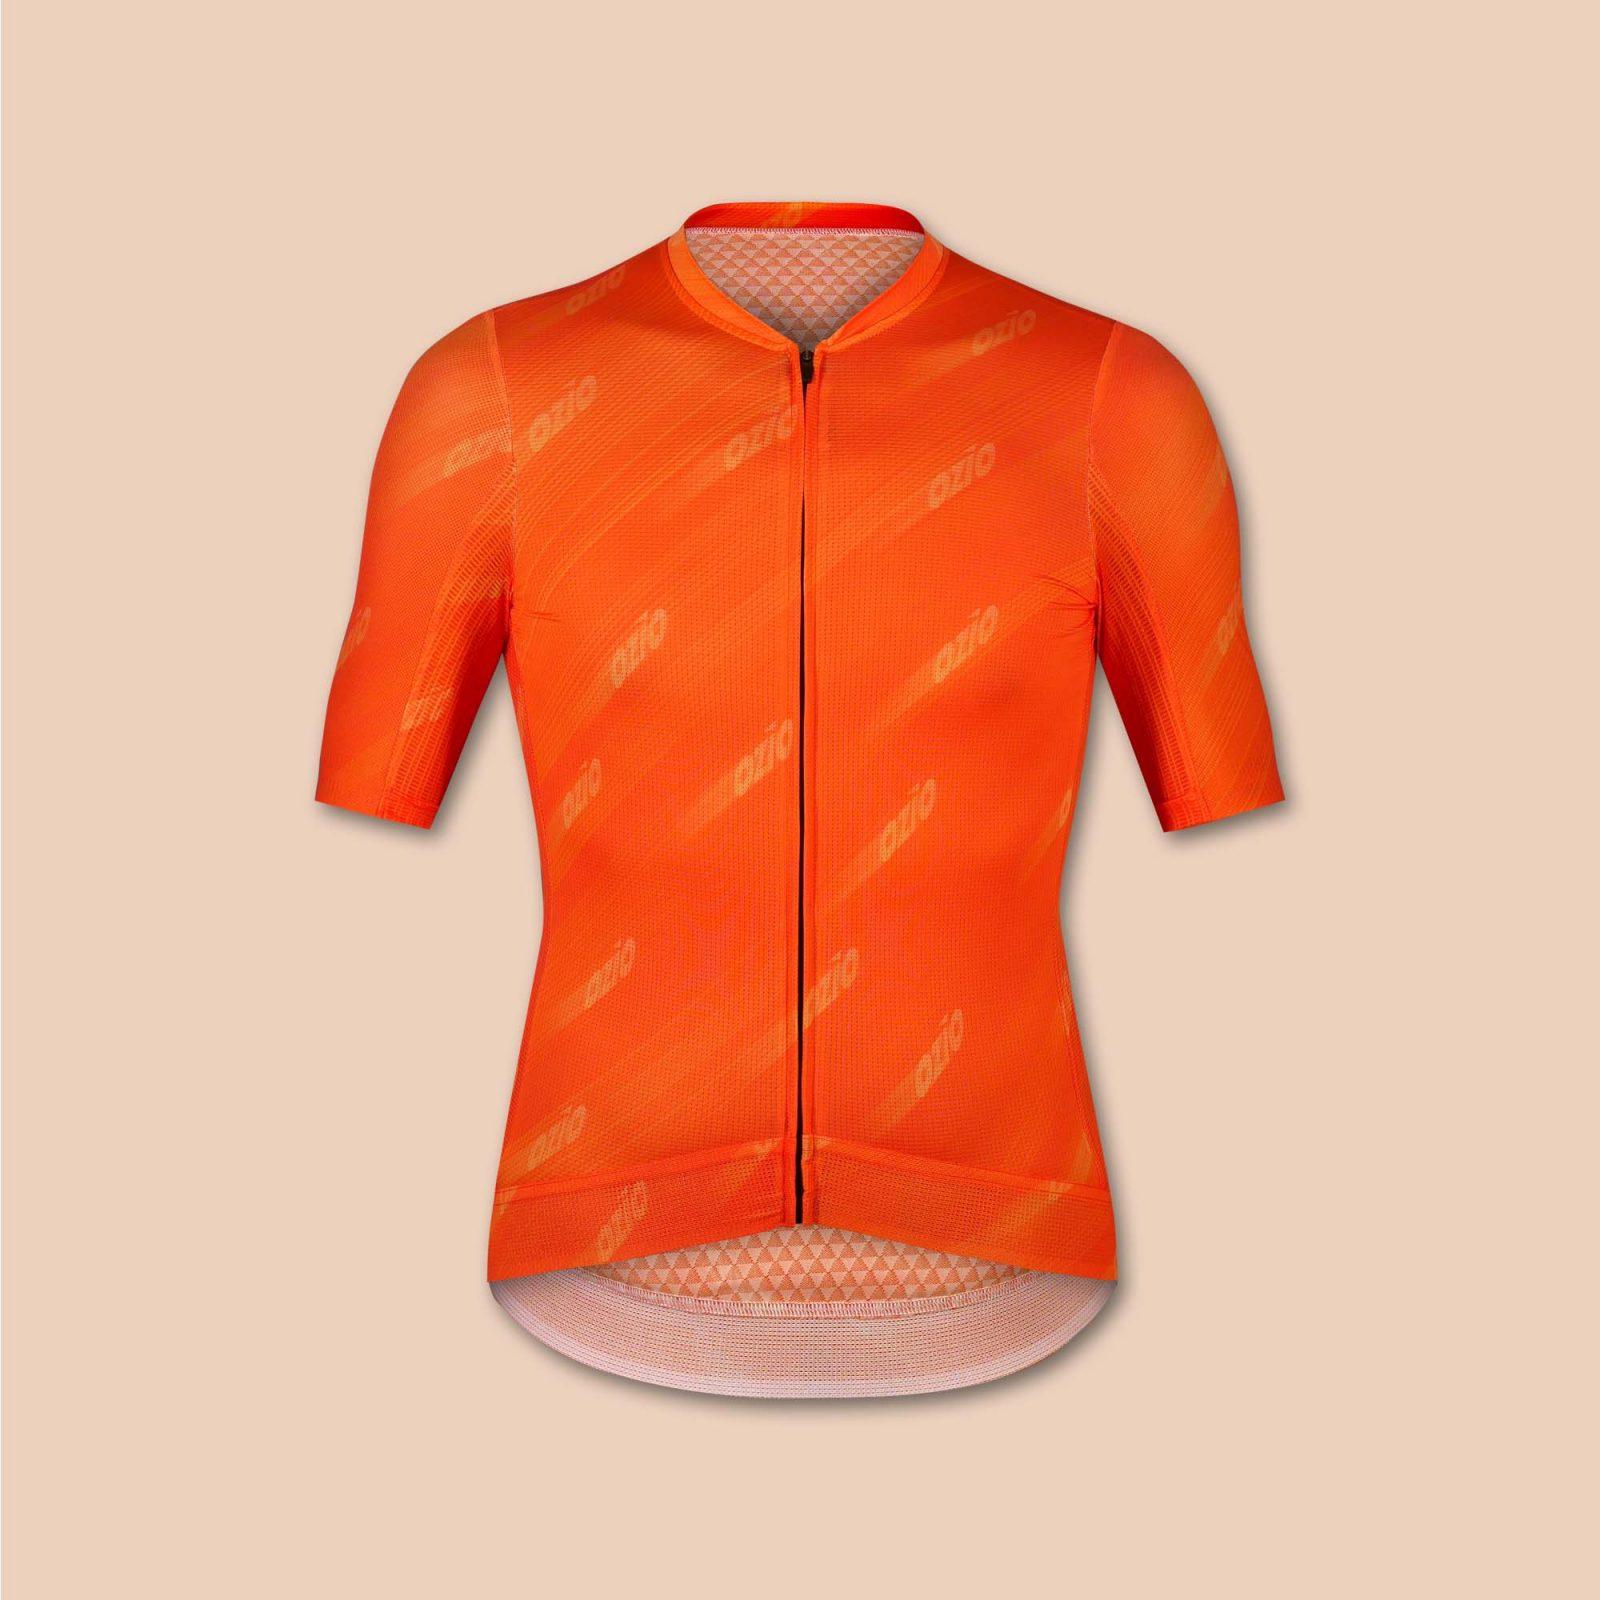 Maillot homme vélo orange uni ozio